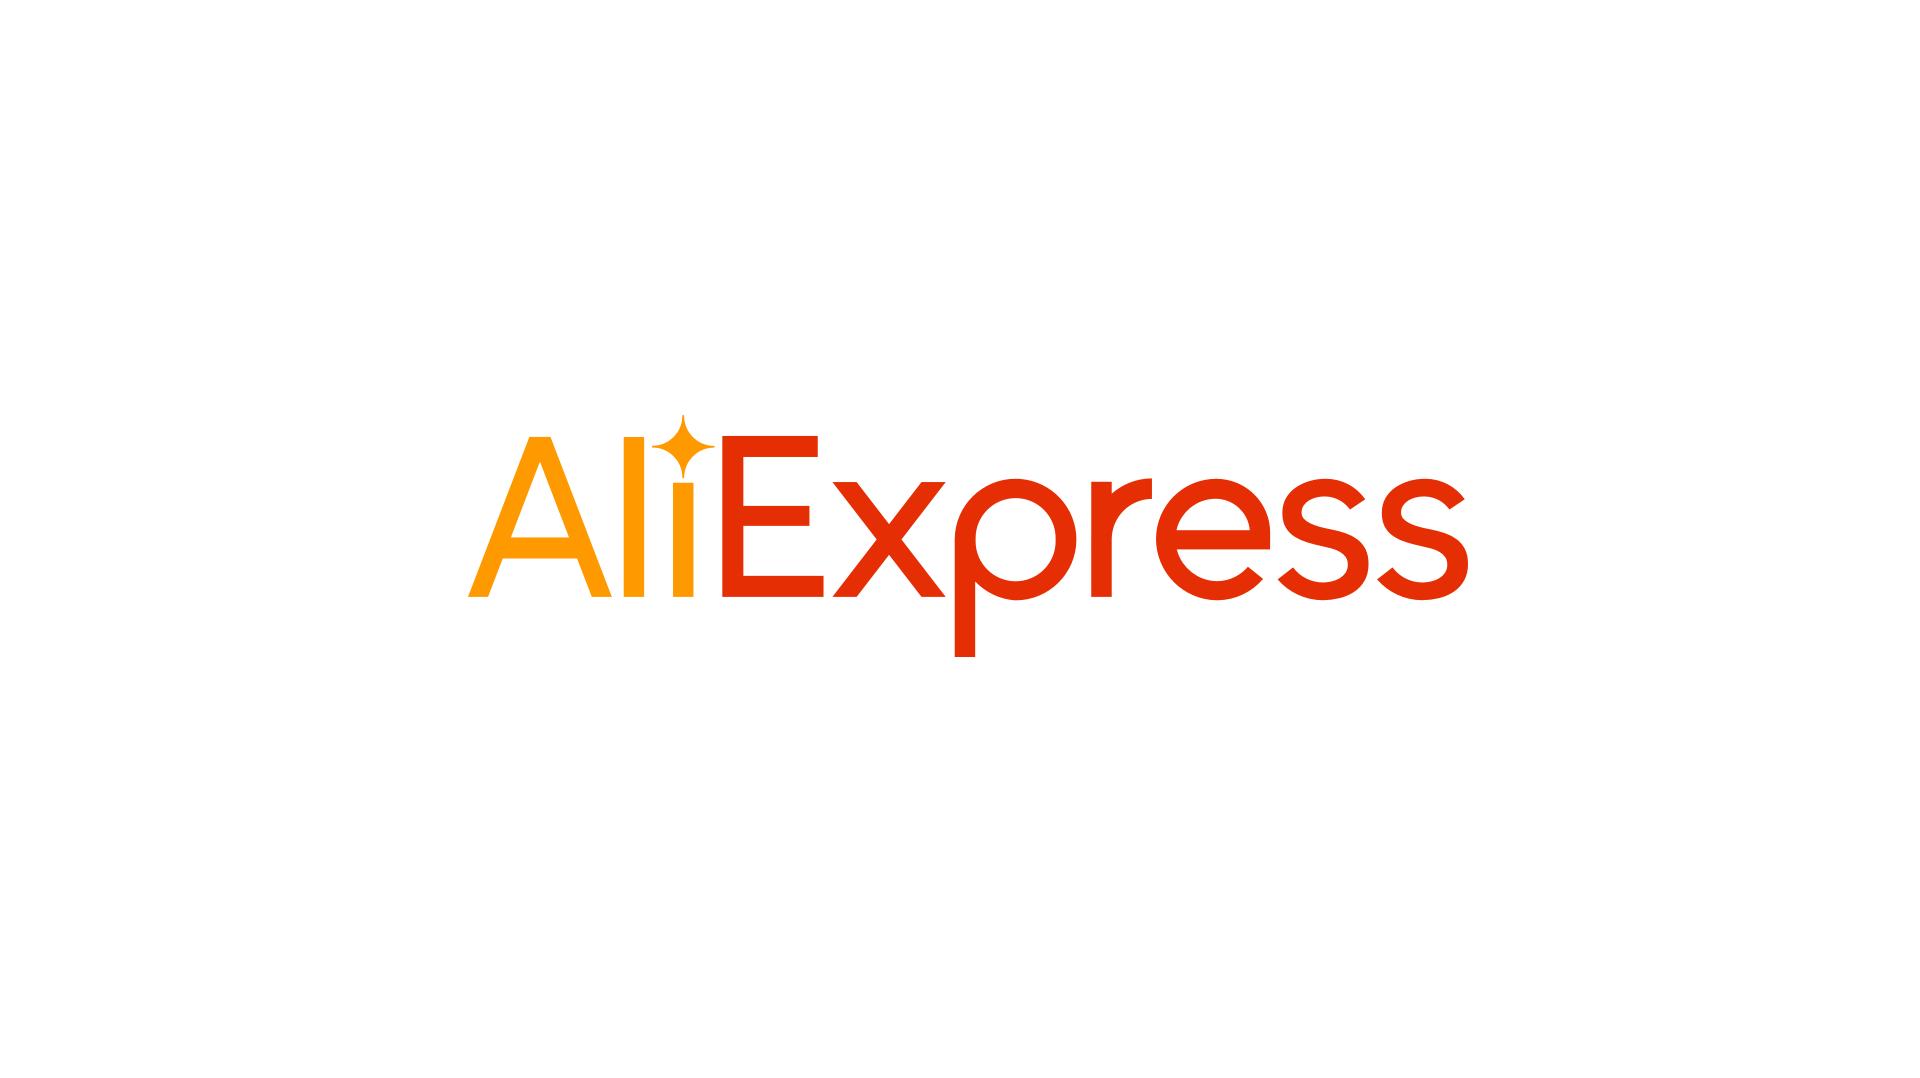 Faire du dropshipping avec Aliexpress